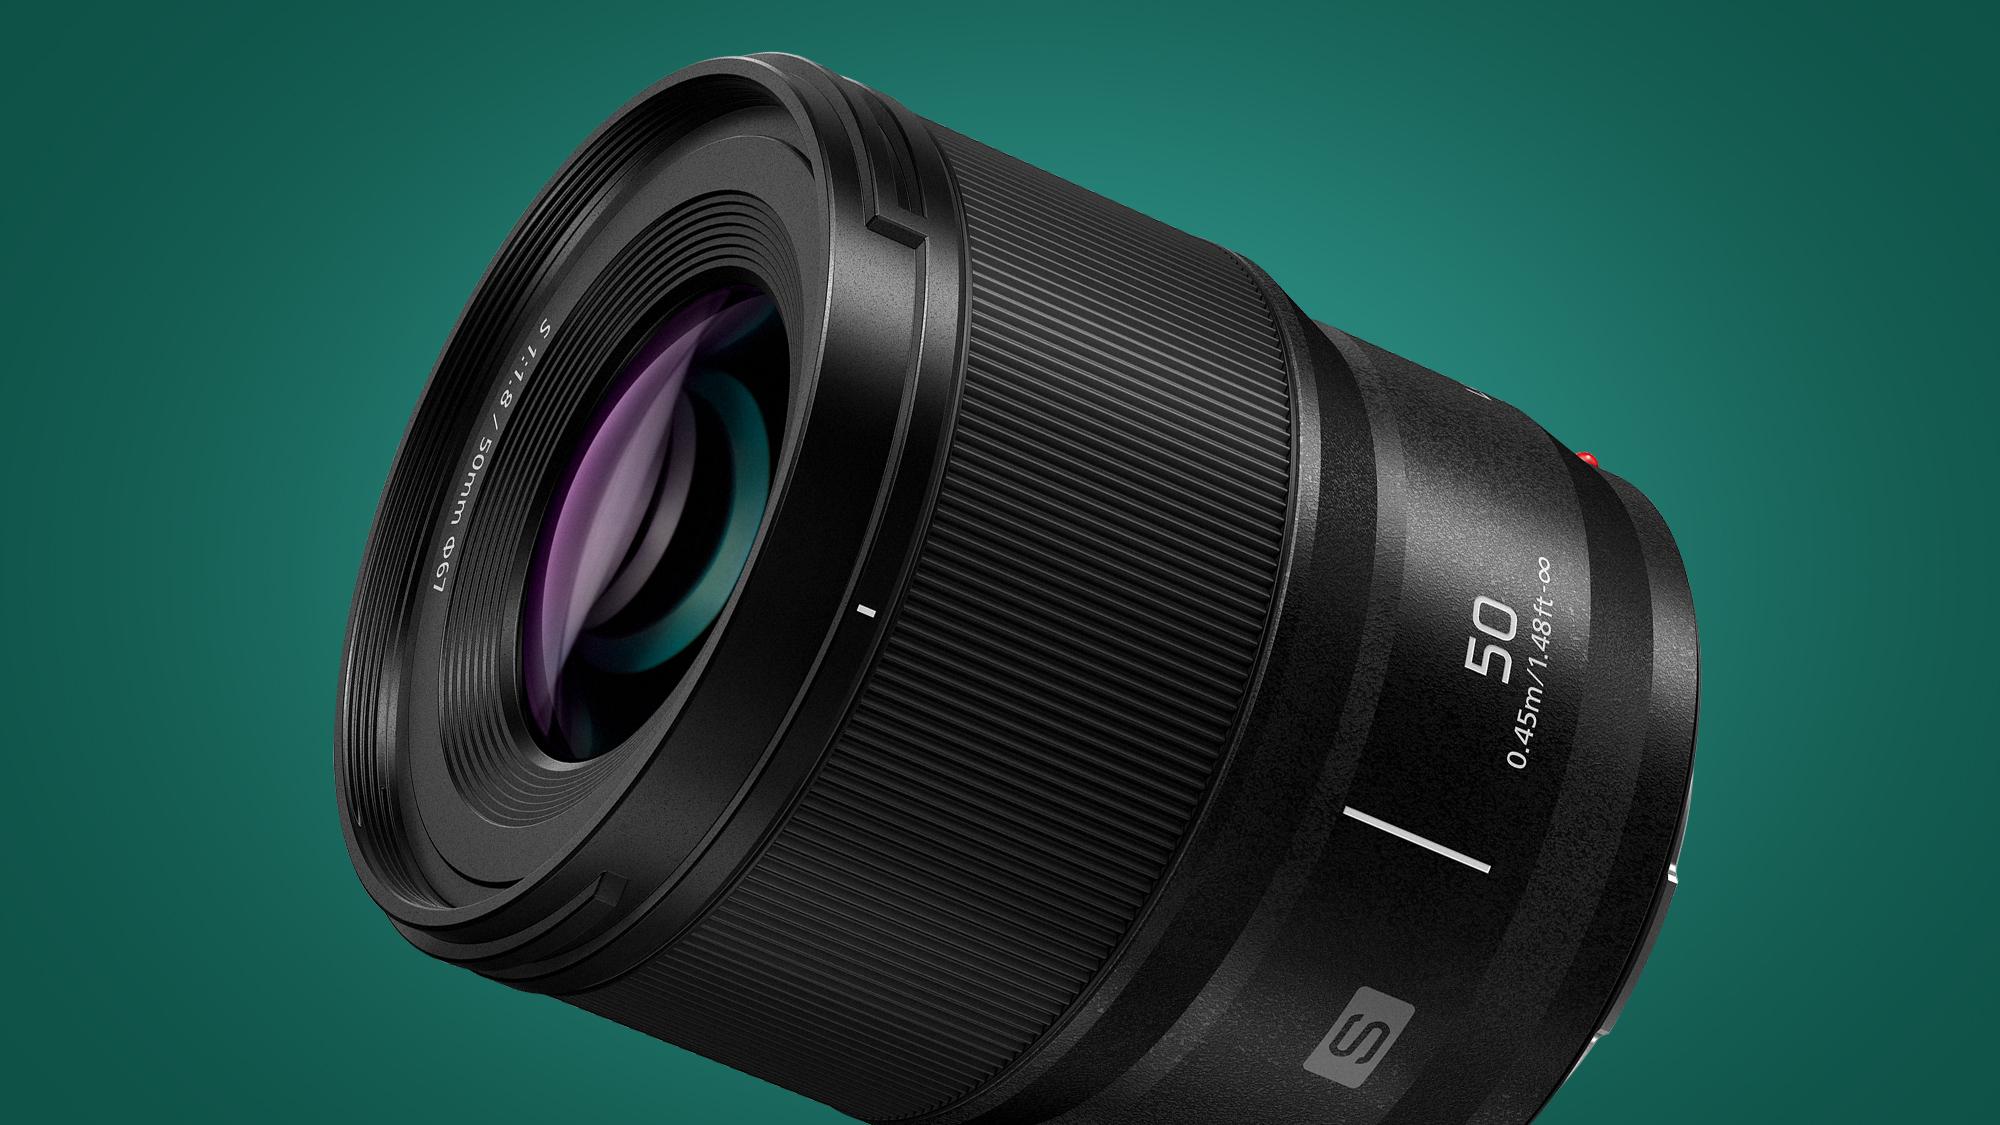 Panasonic launches bargain 50mm prime lens for full-frame Lumix cameras